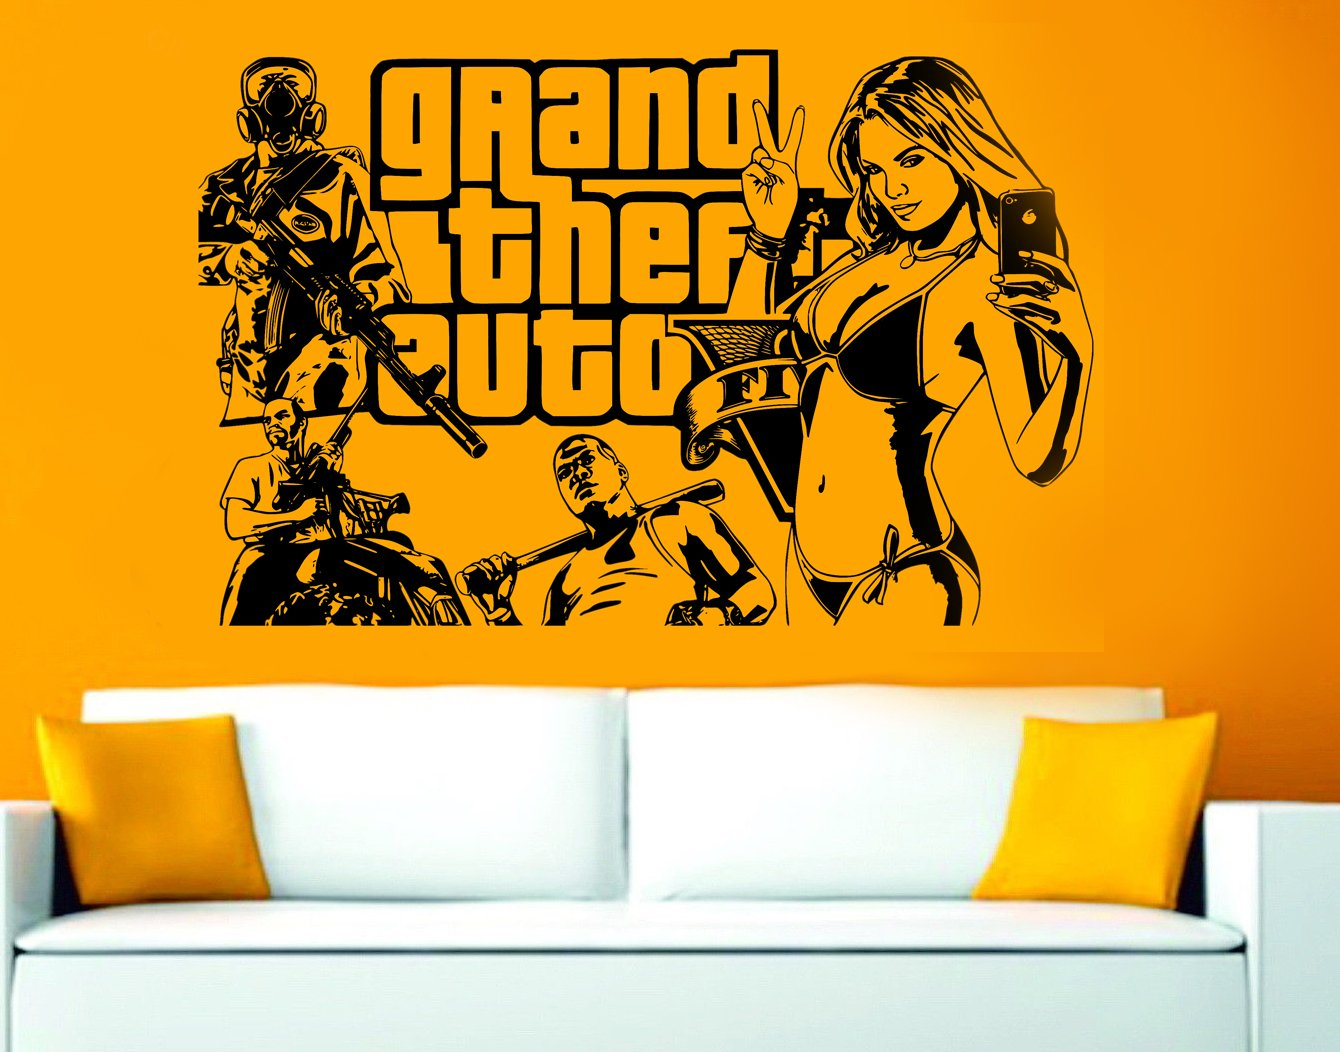 GTA 5 Grand Theft Auto 5 Wall Art Sticker/Decal (Gold): Amazon.co.uk ...